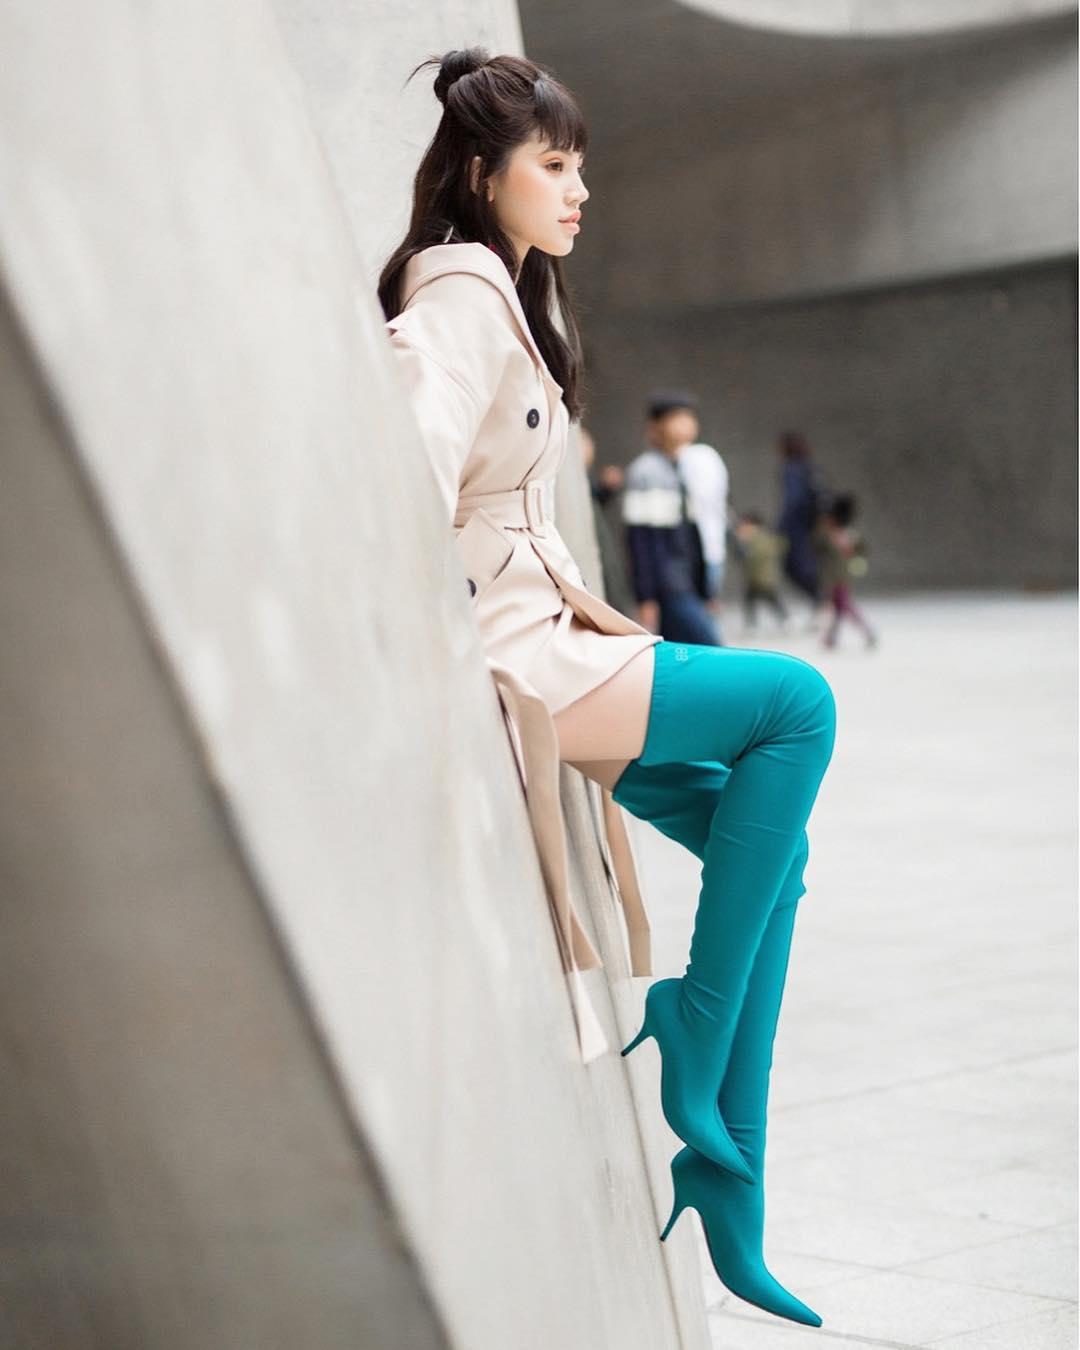 jolie-nguyen-balenciaga-hoa-tiet-ngam-nghia-street-style-cua-sao-viet-tai-seoul-fashion-week